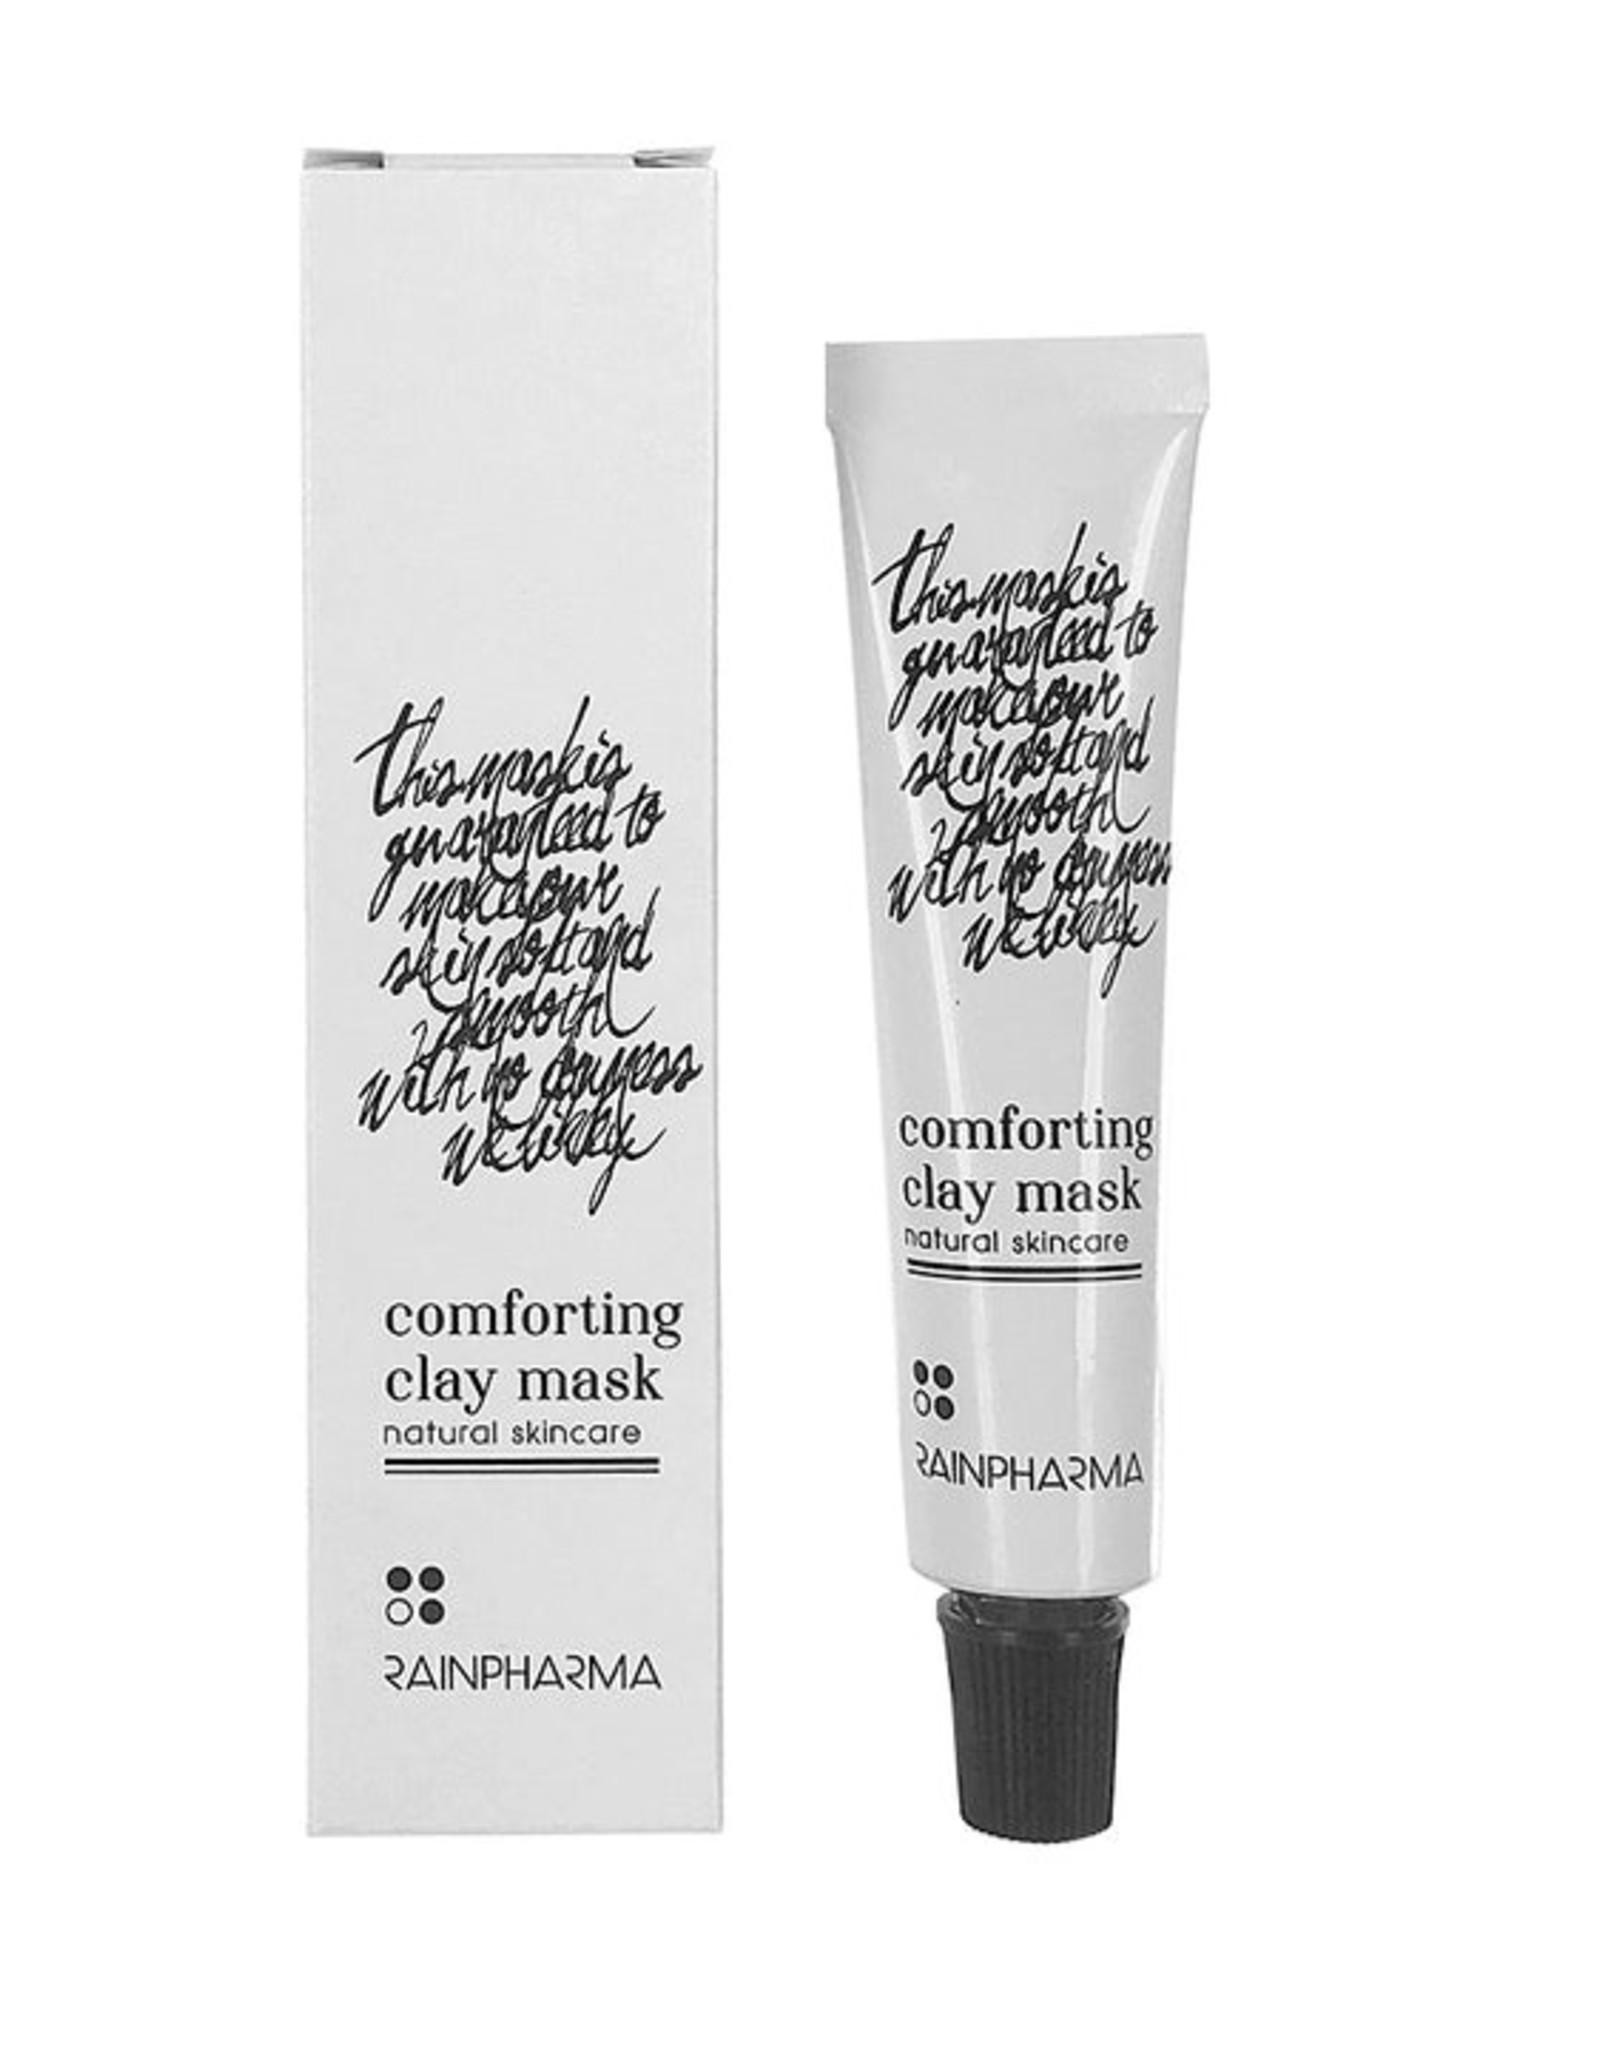 RainPharma TRAVEL - Comforting Clay Mask Tube 10ml - Rainpharma